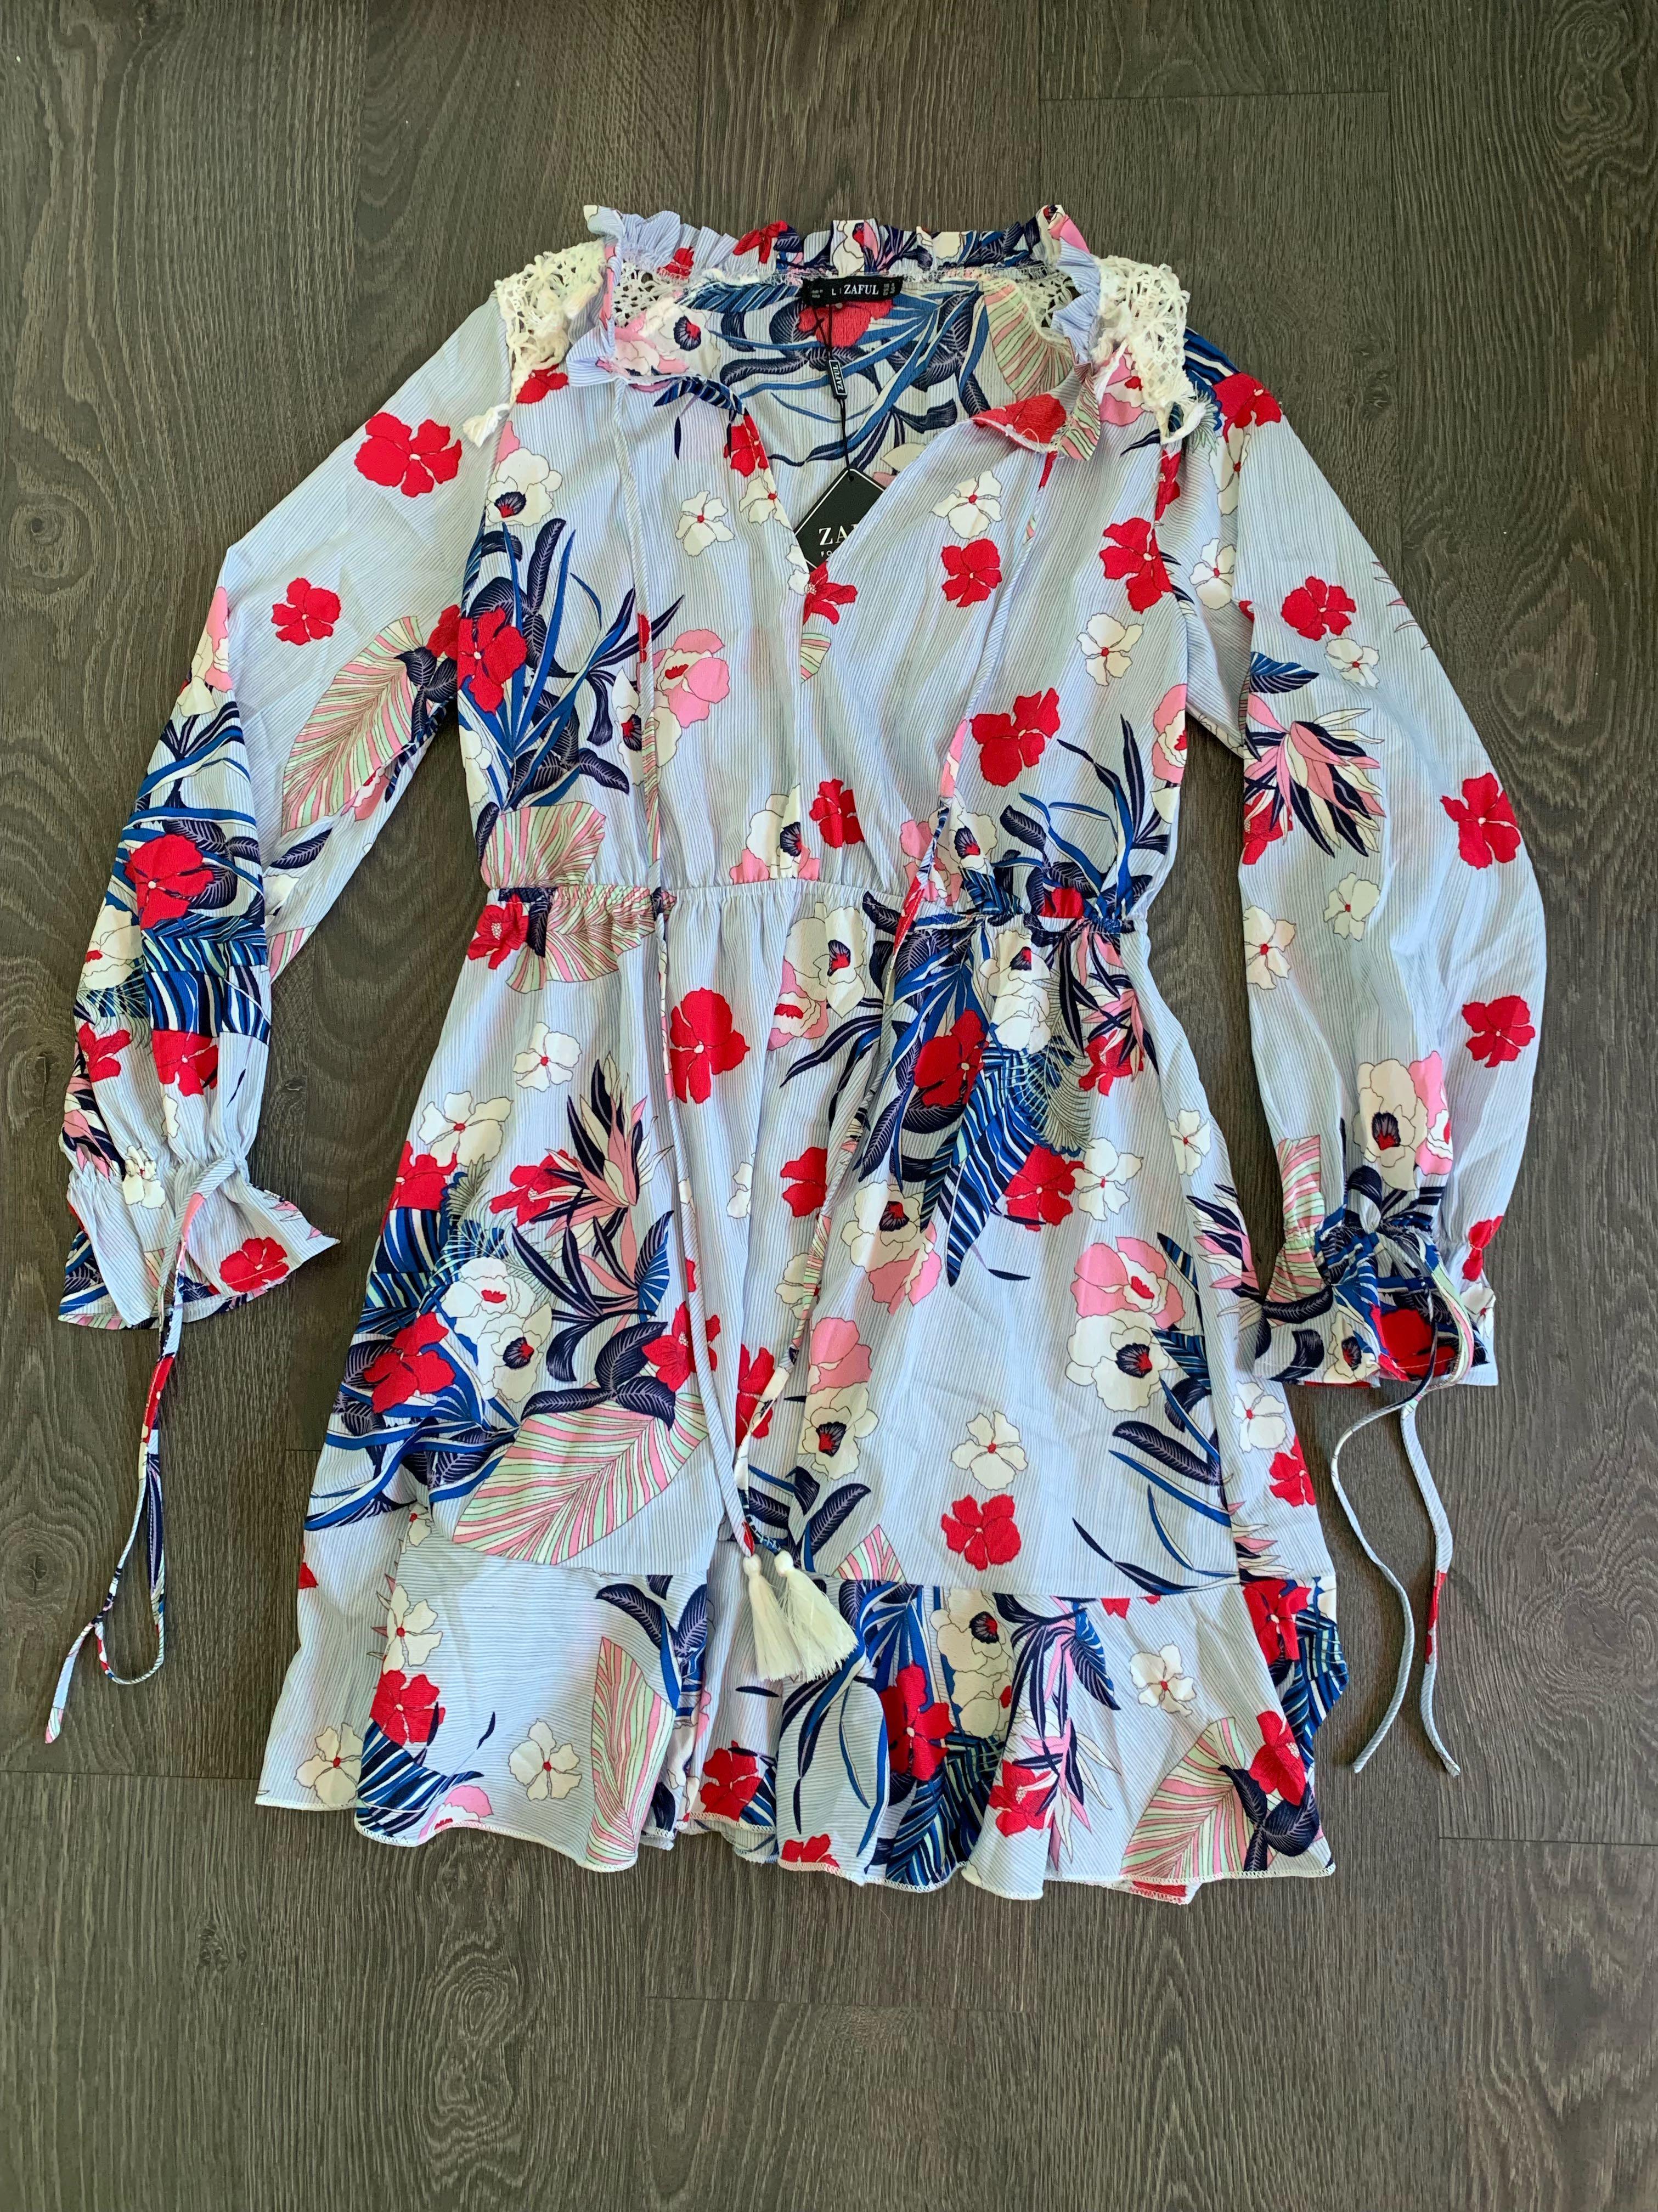 NEW ZAFUL Dress Size Medium Summer Dress Beach Vacation  Wear